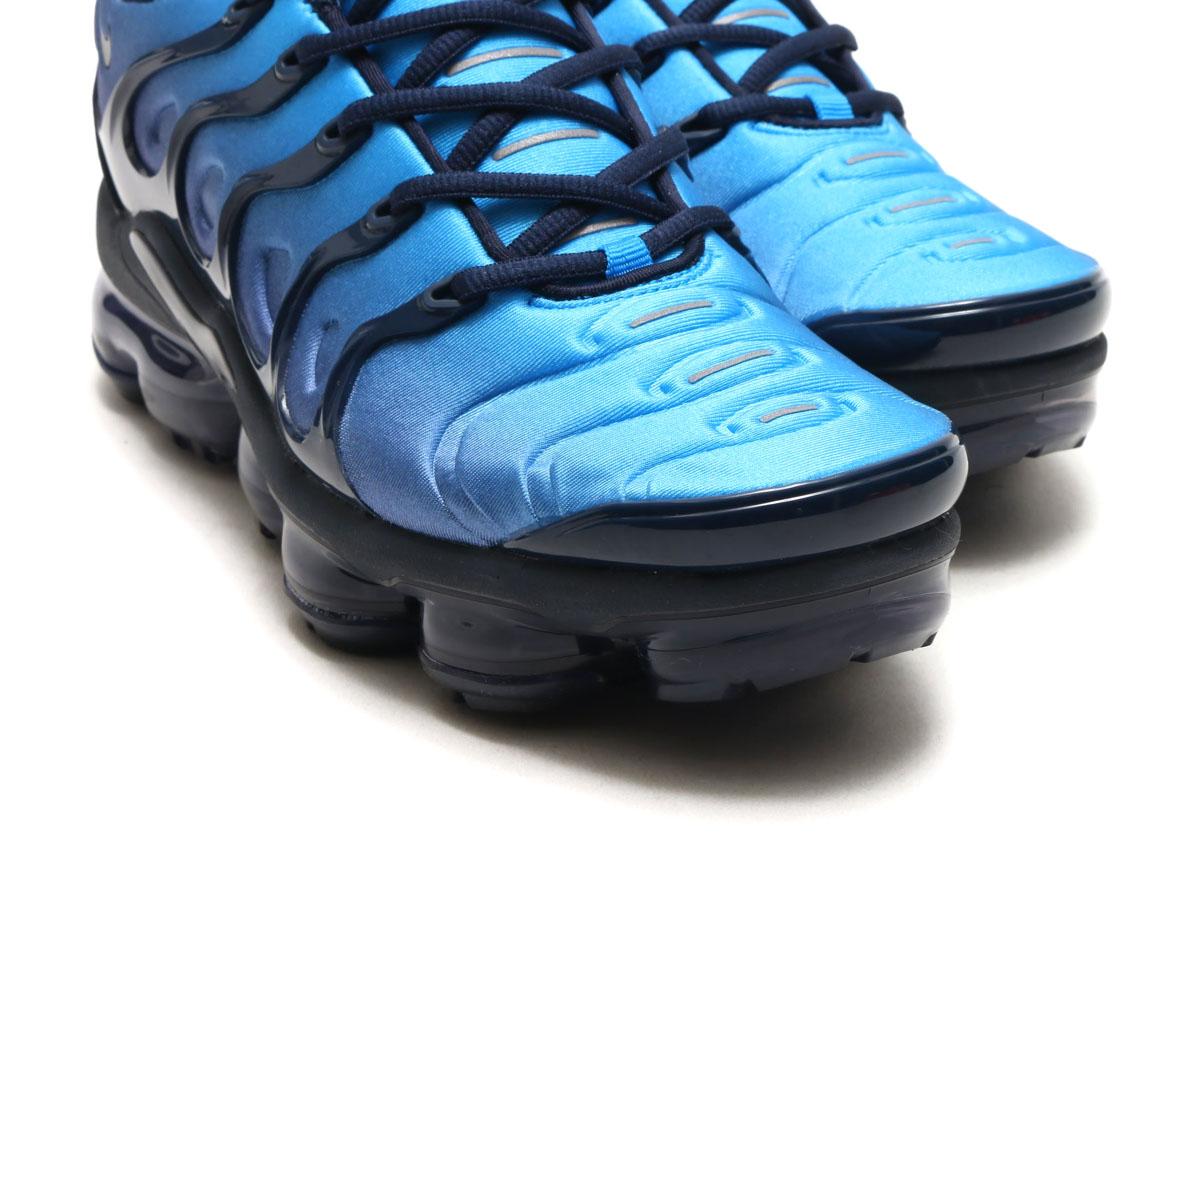 6848073bb7e NIKE AIR VAPORMAX PLUS (Nike air vapor max plus) OBSIDIAN OBSIDIAN-PHOTO  BLUE-BLACK 18SS-S